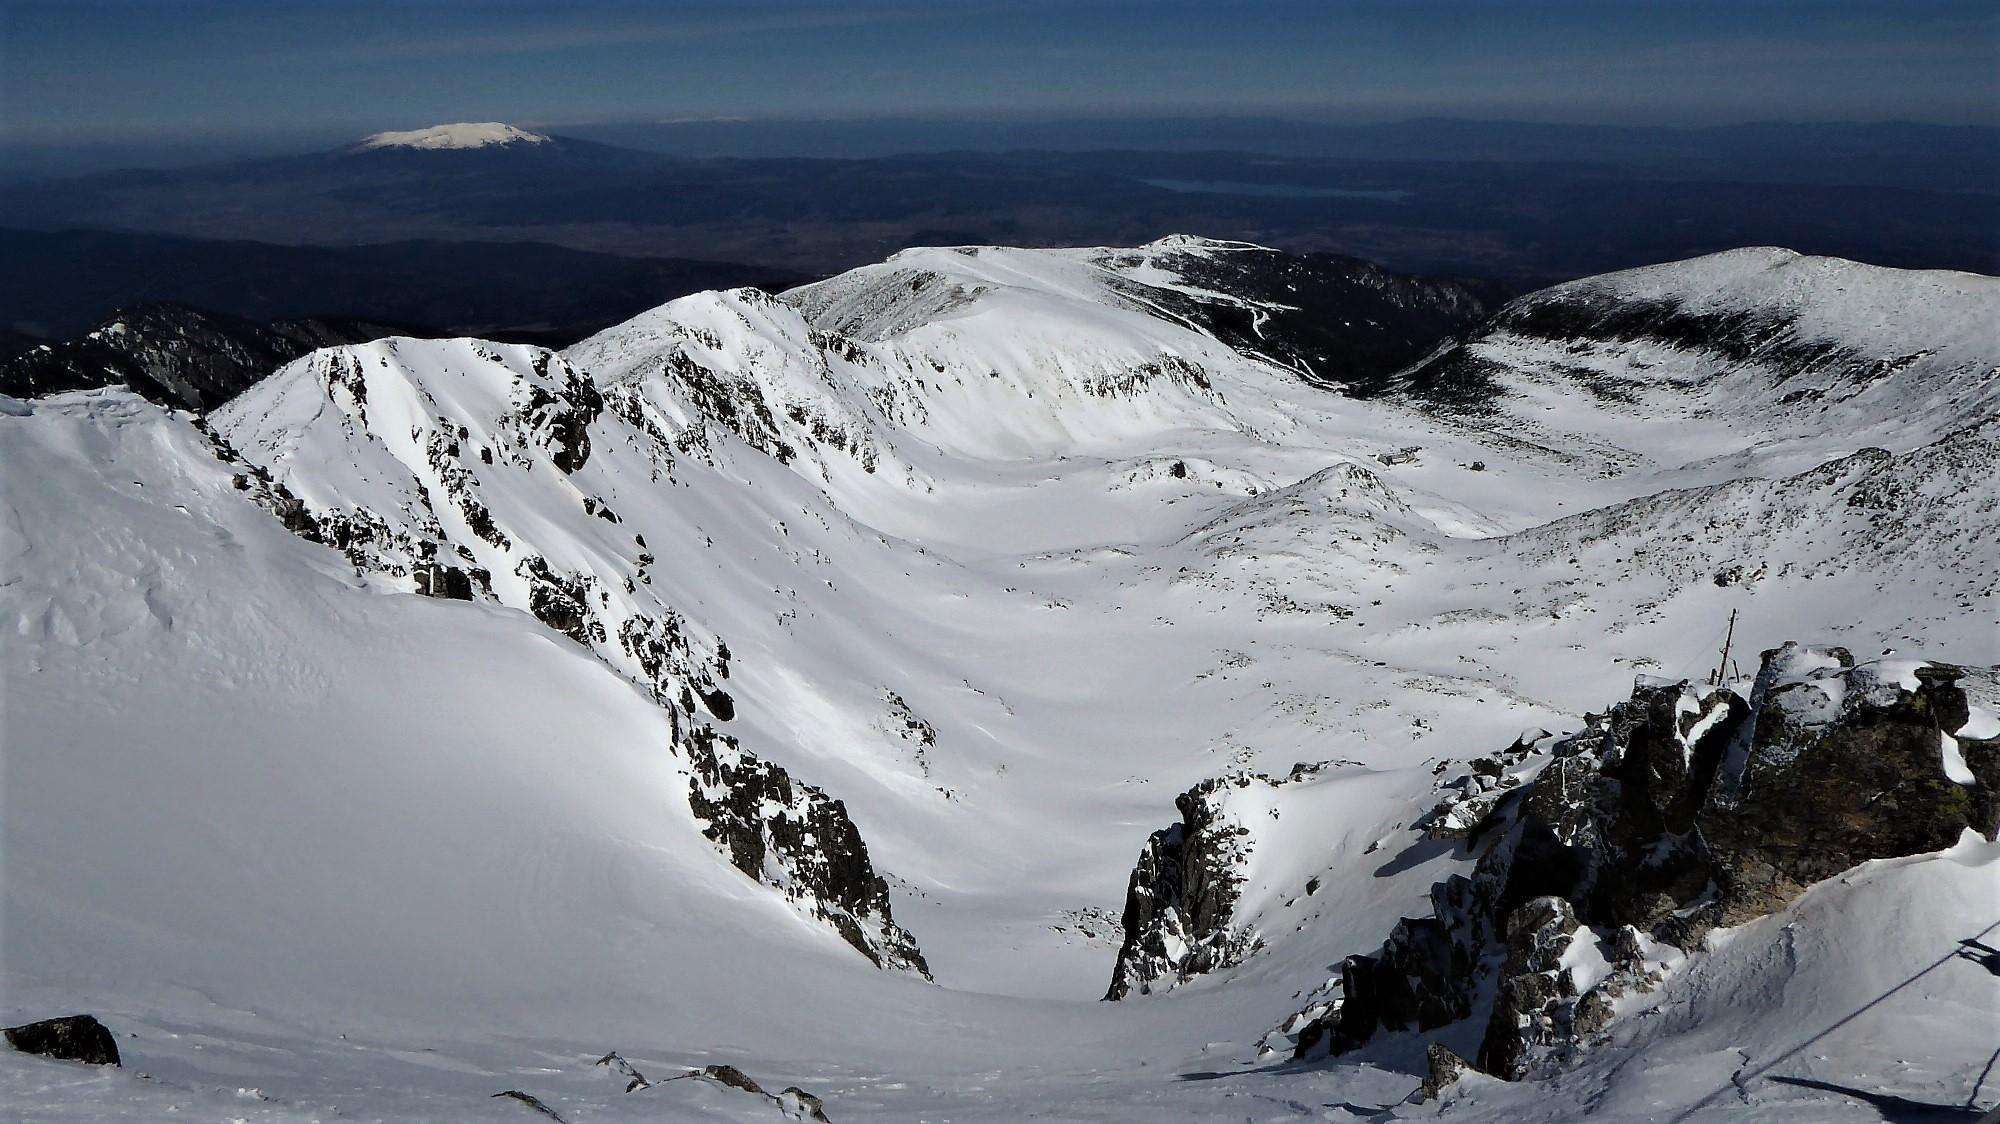 Pogled z vrha Balkana proti severu.. Musala je odlična smučarska gora.